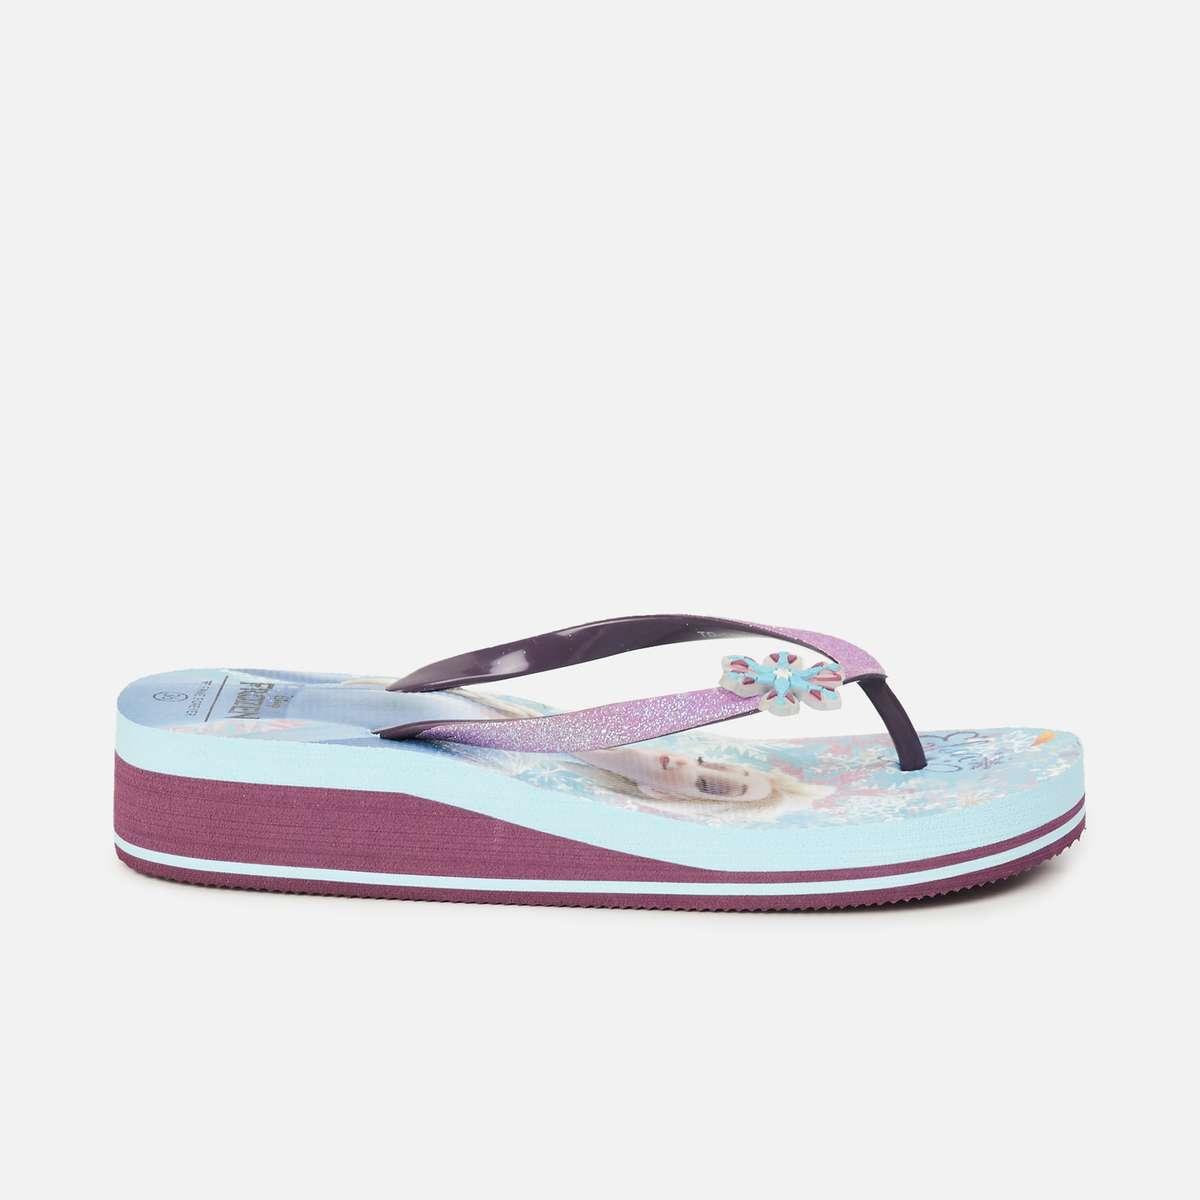 3.FAME FOREVER Girls Printed Flip Flops